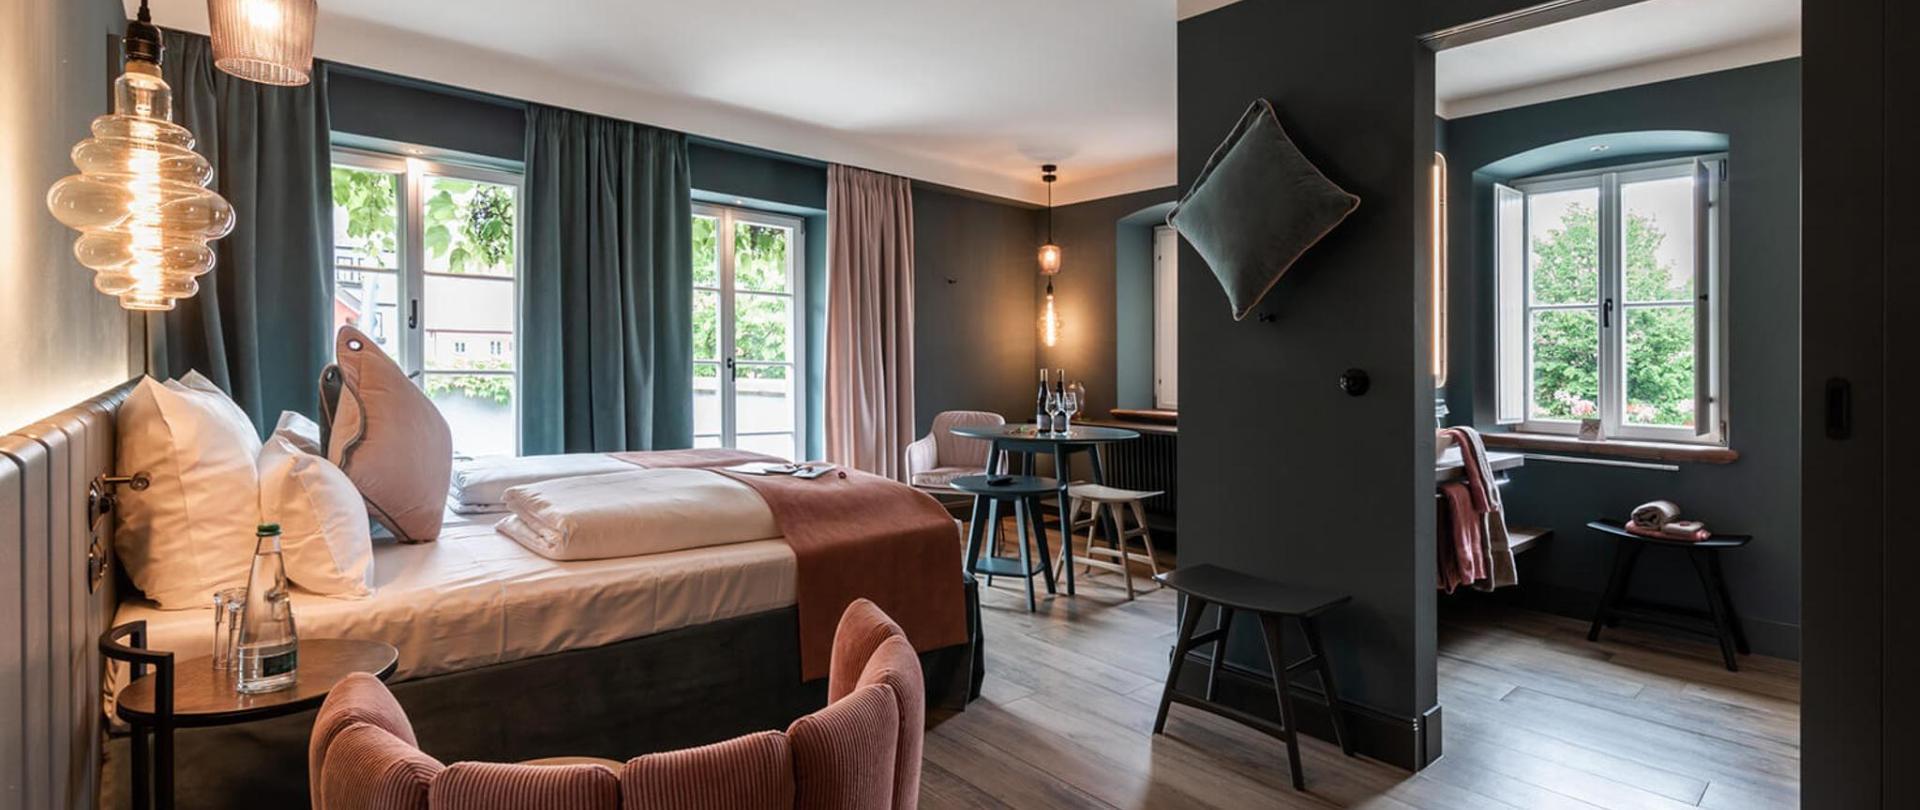 Hotel / Weingut Meintzinger